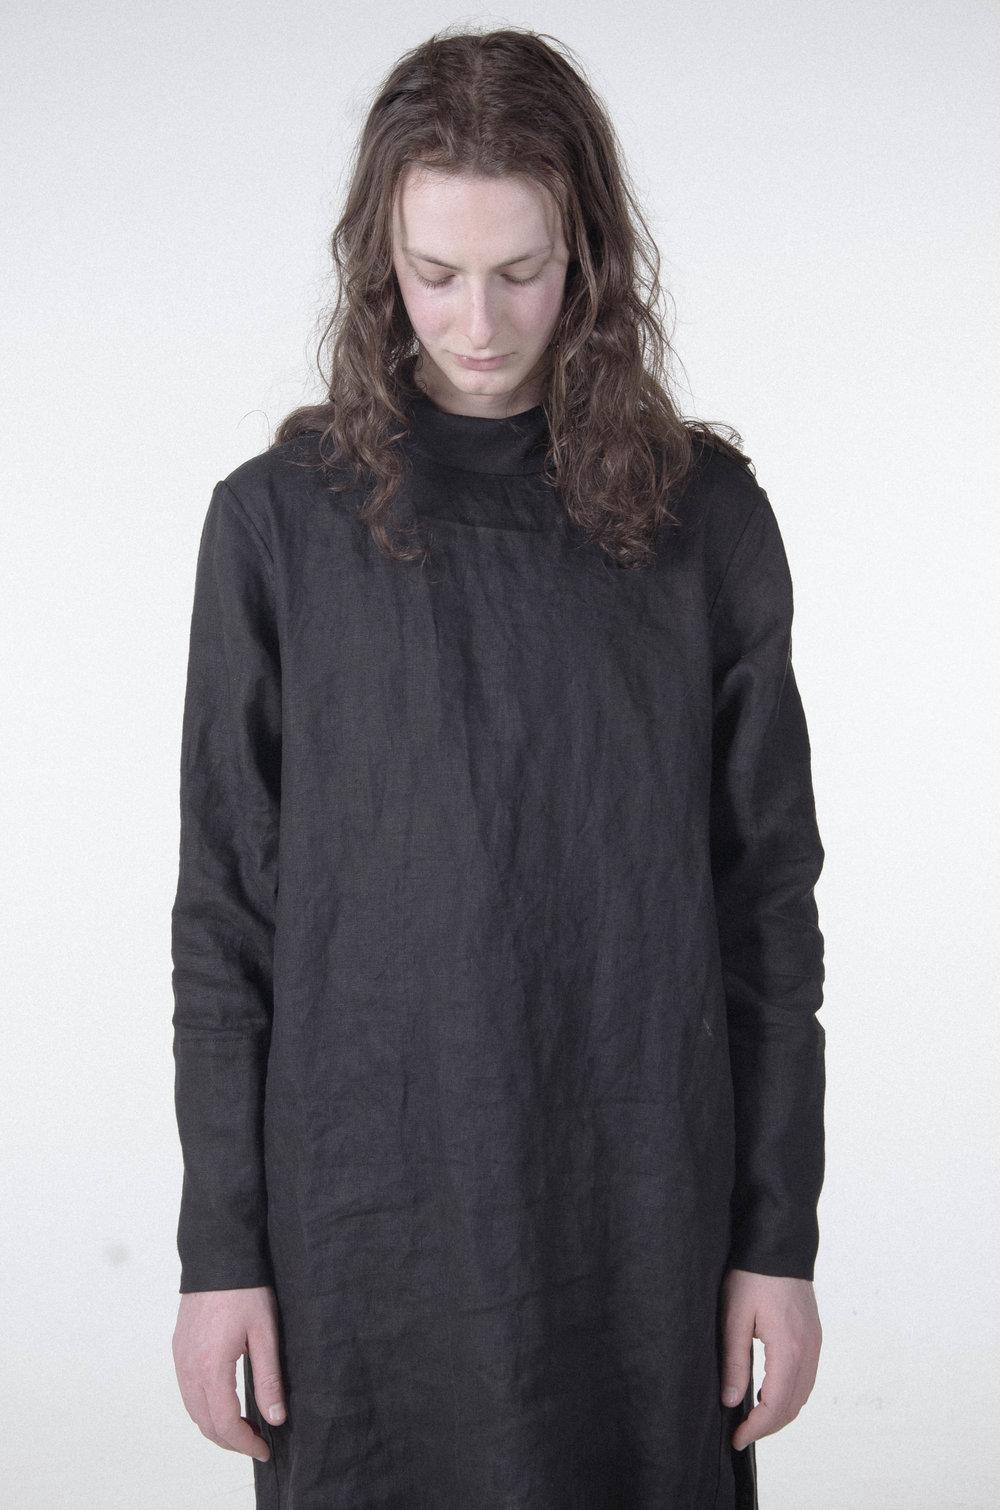 agoraphobia-collective-britt-pooley-sideways-collar-identity-shirt